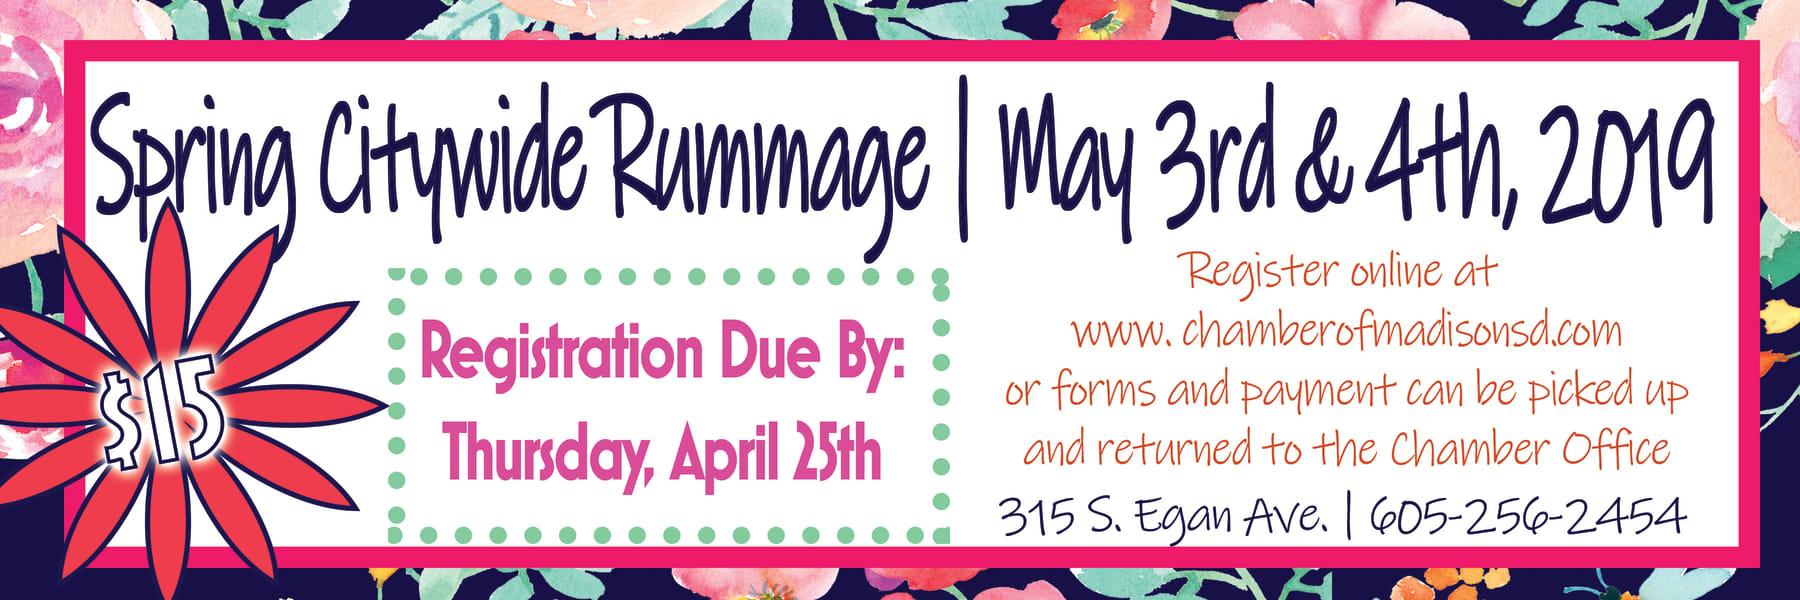 Spring-Citywide-Rummage-Web-Banner(1).jpg